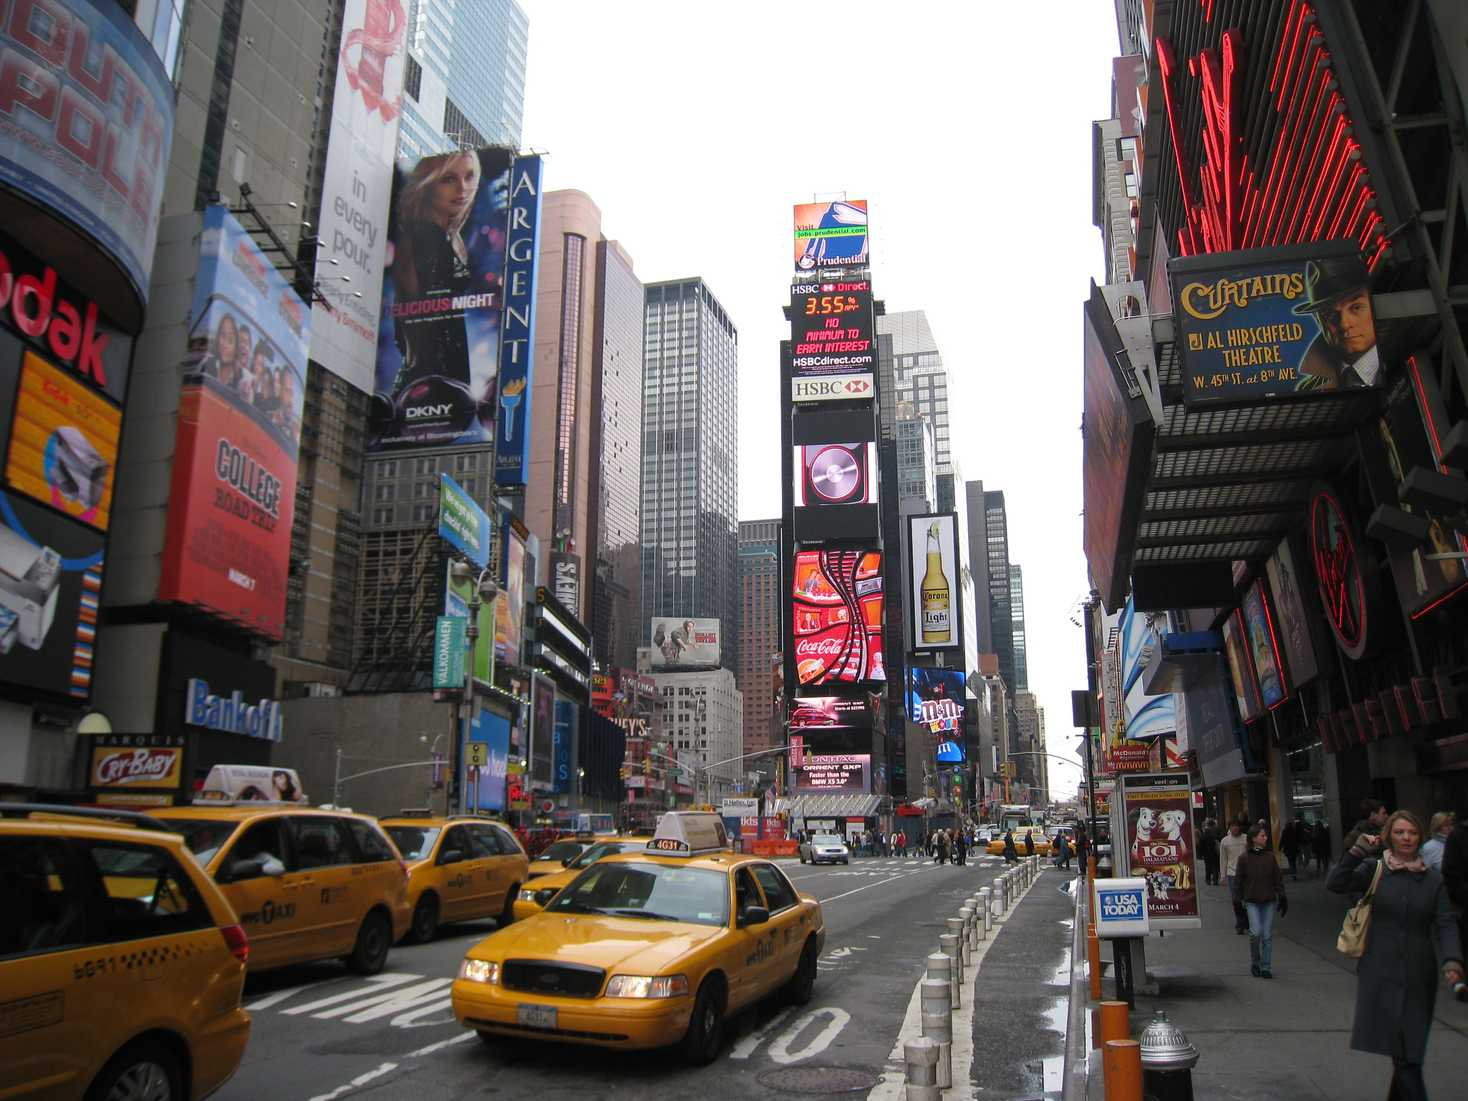 http://www.italianfashionbloggers.com/wp-content/uploads/2012/01/new-york2.jpeg